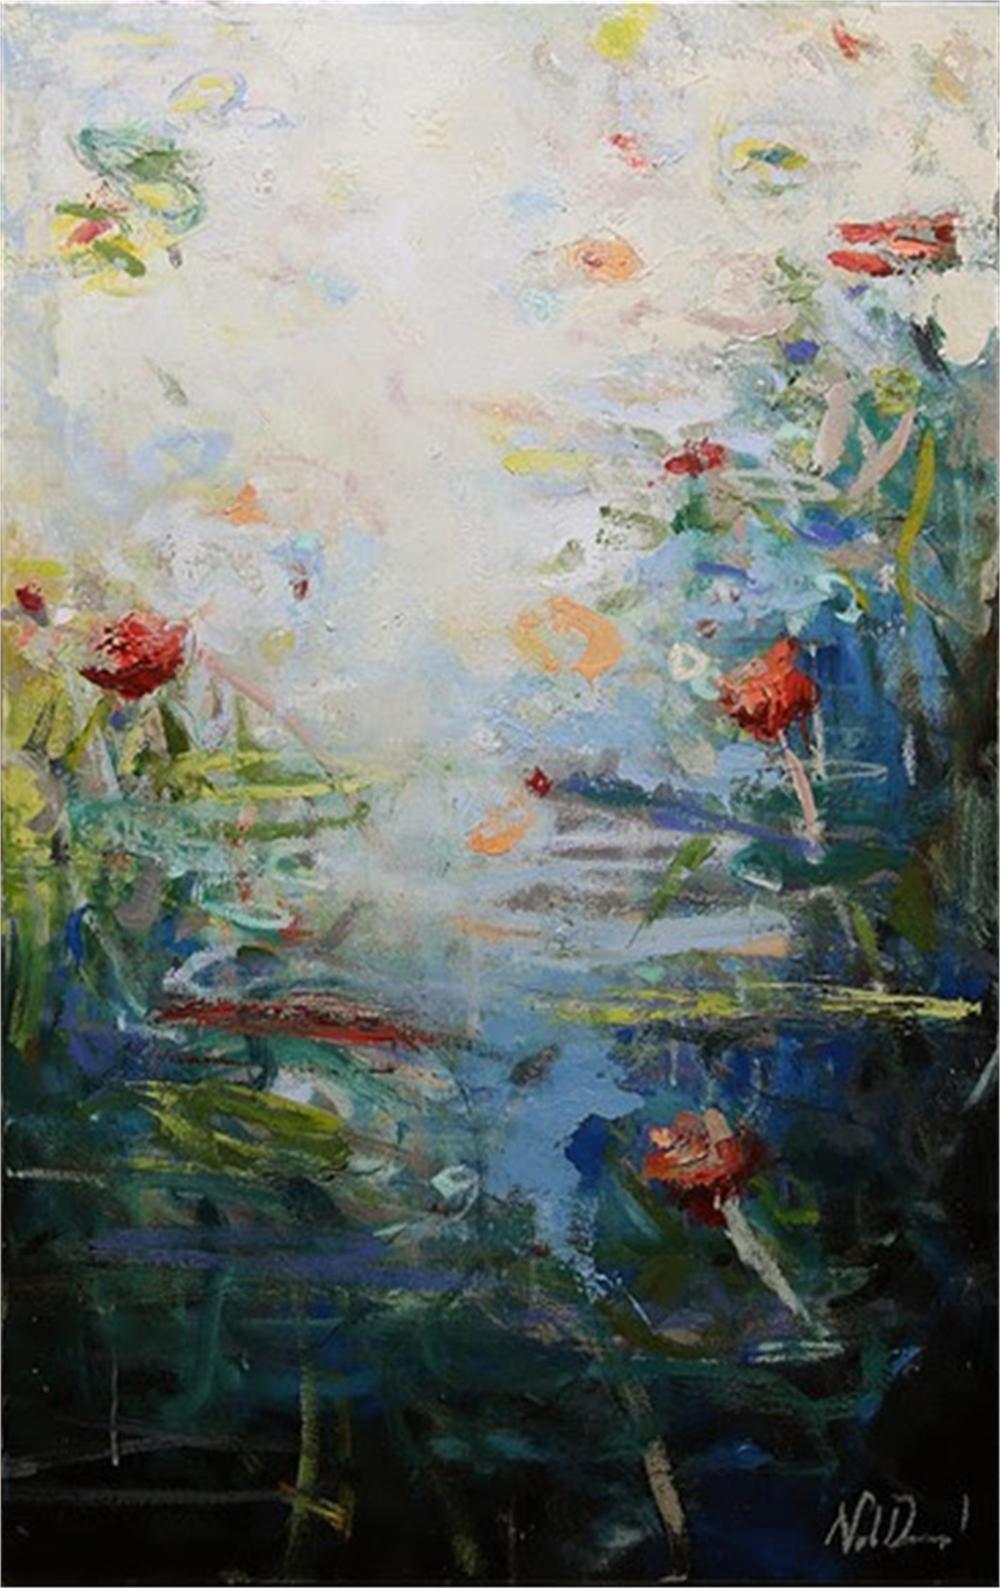 What Dreams May Come Painting : dreams, painting, Dreams, Desmond, Hagan, Come,